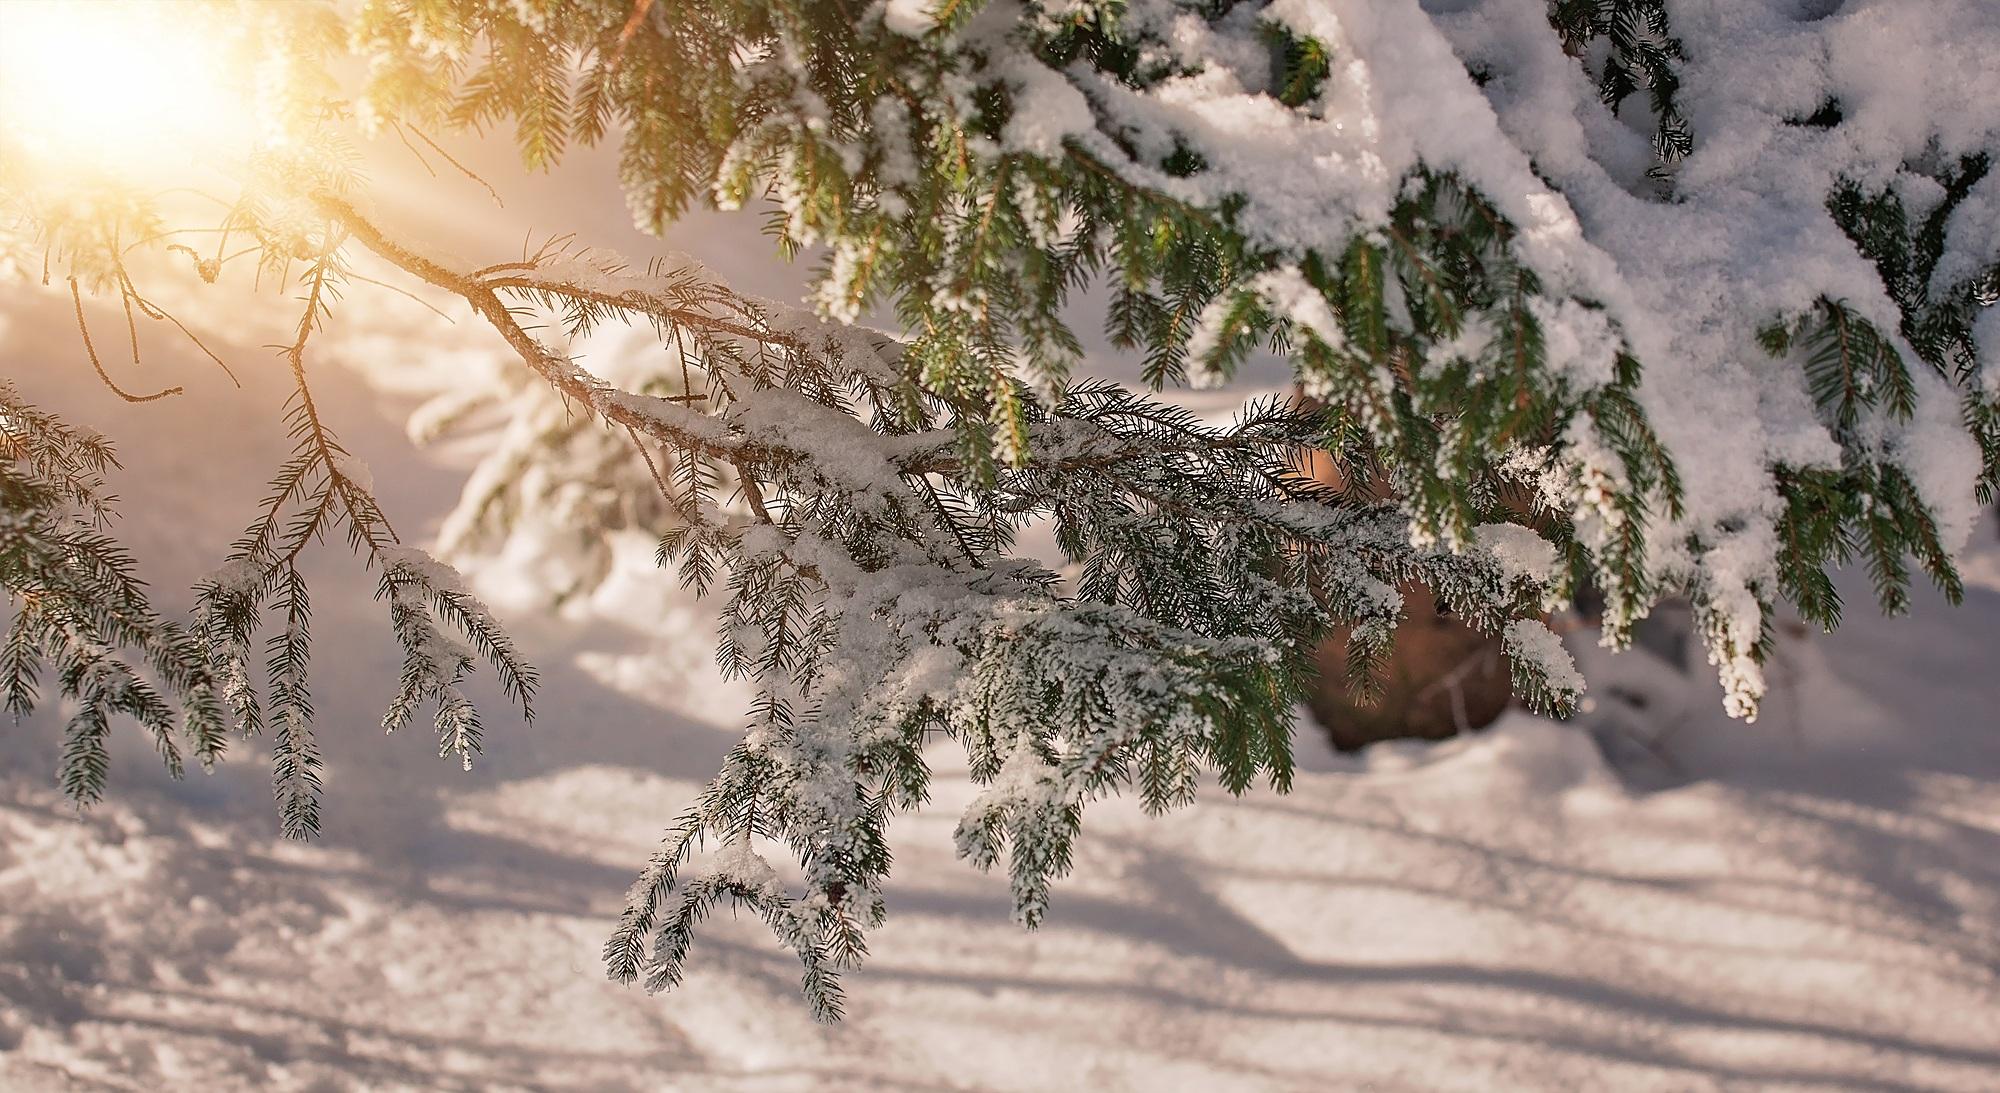 Branch, Frozen, Green, Ice, Snow, HQ Photo